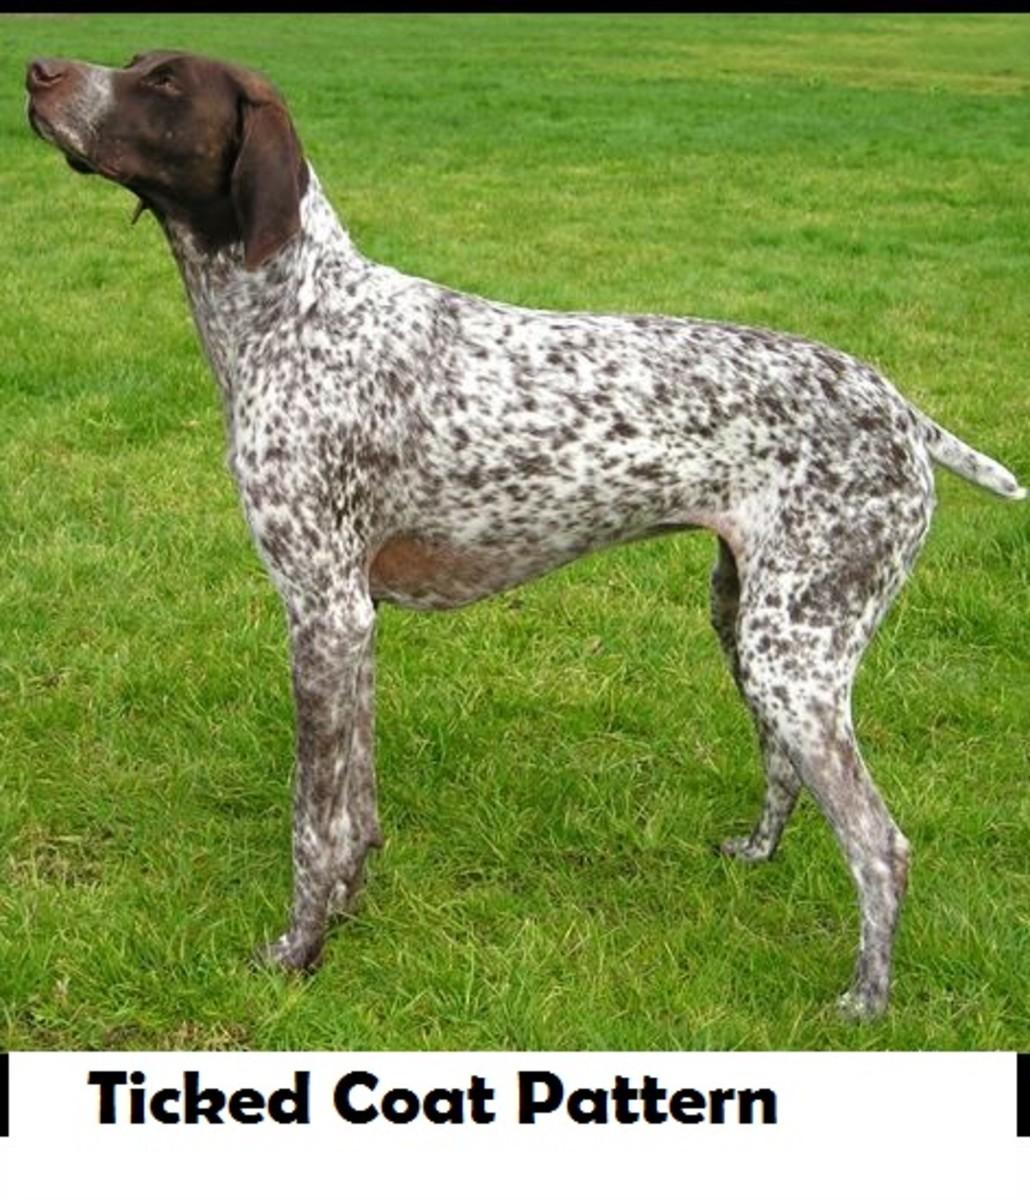 dog-ticked-coat